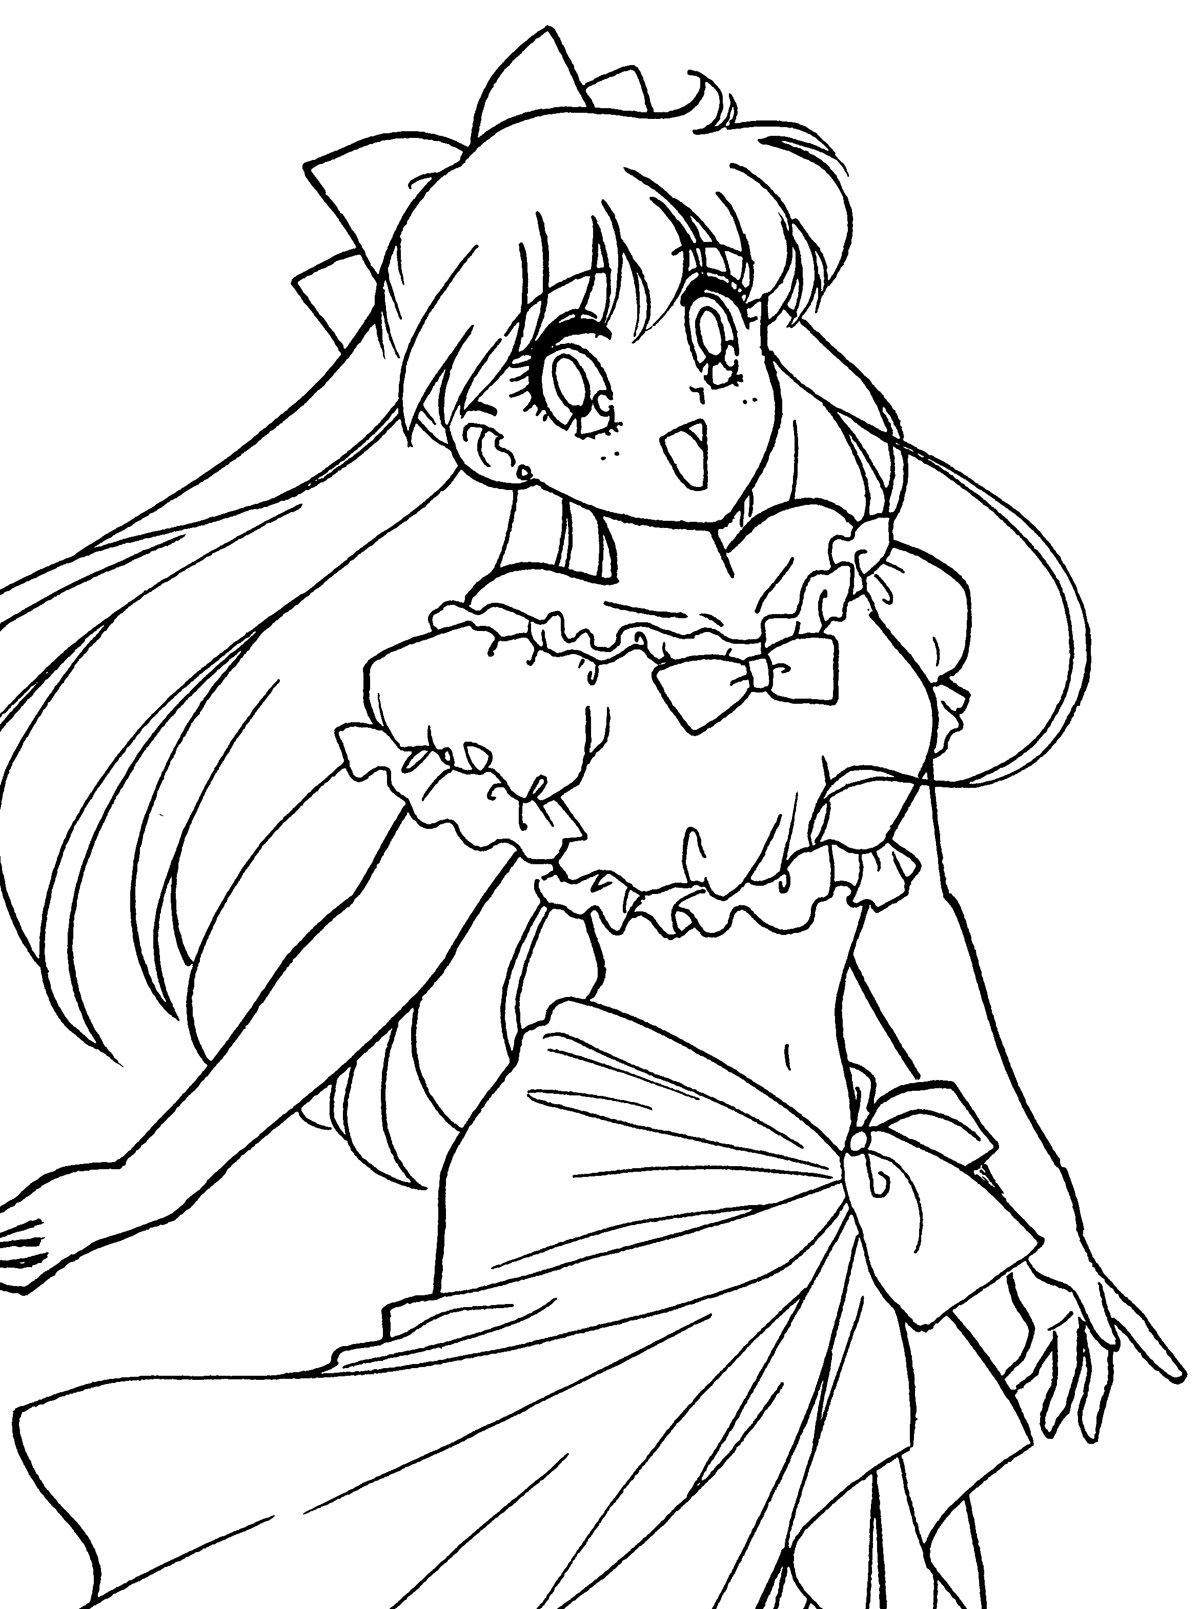 Aino minako coloring page sailormoon sailor moon for Sailor venus coloring pages